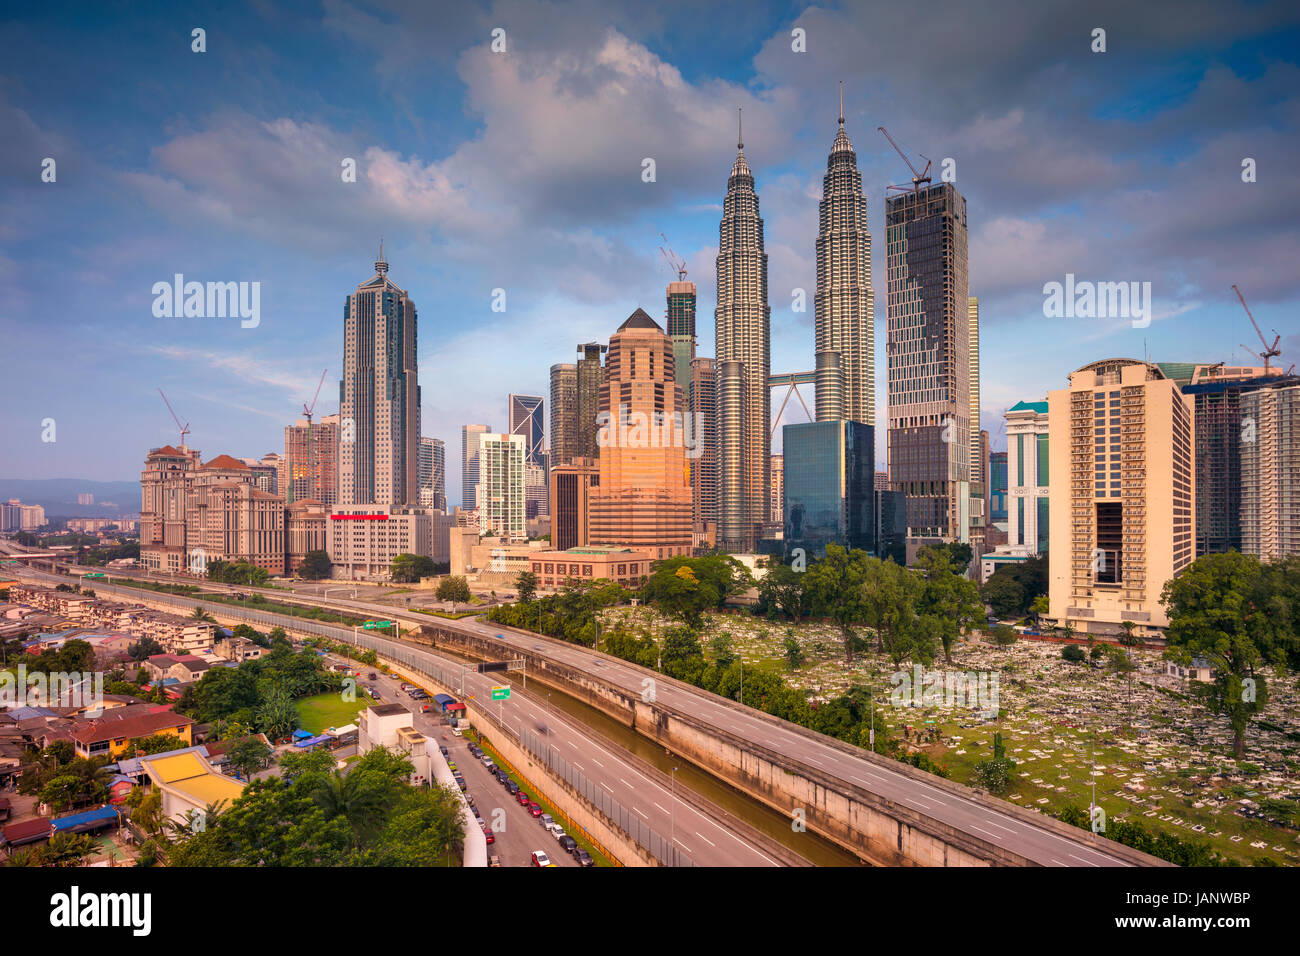 Kuala Lumpur. Imagen del paisaje urbano de Kuala Lumpur, Malasia durante el día. Imagen De Stock